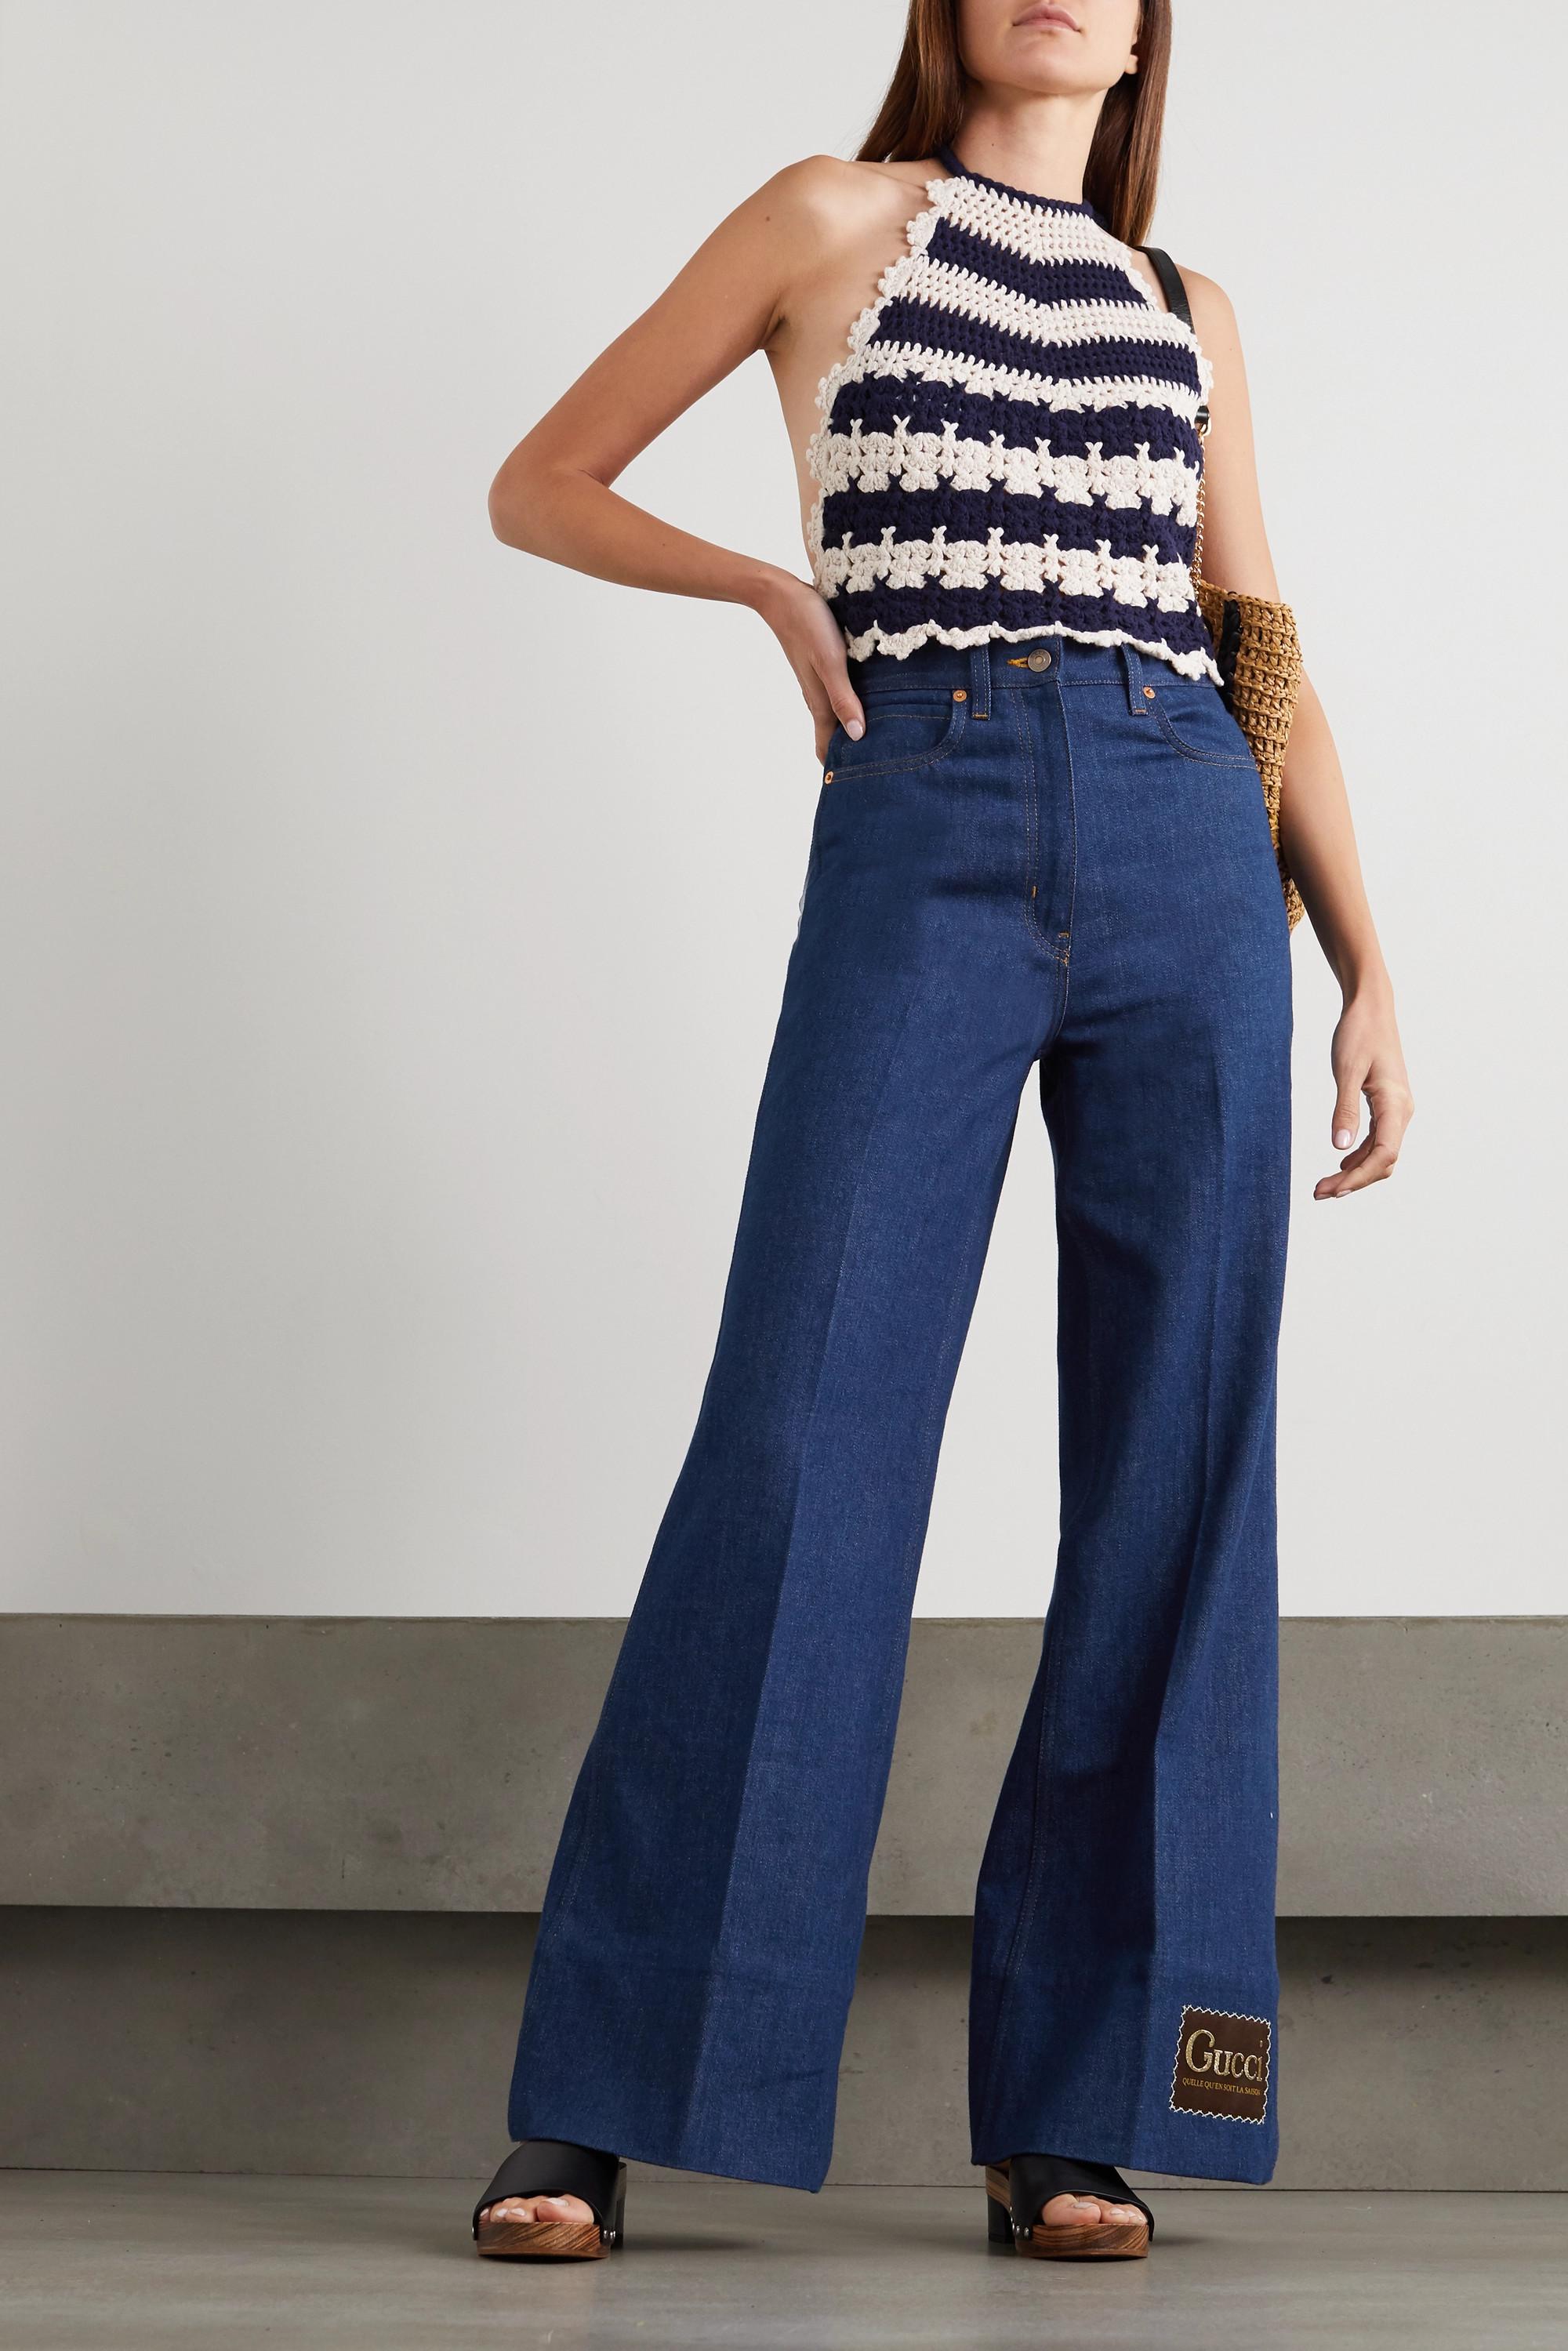 Gucci Open-back appliquéd striped crocheted wool halterneck top